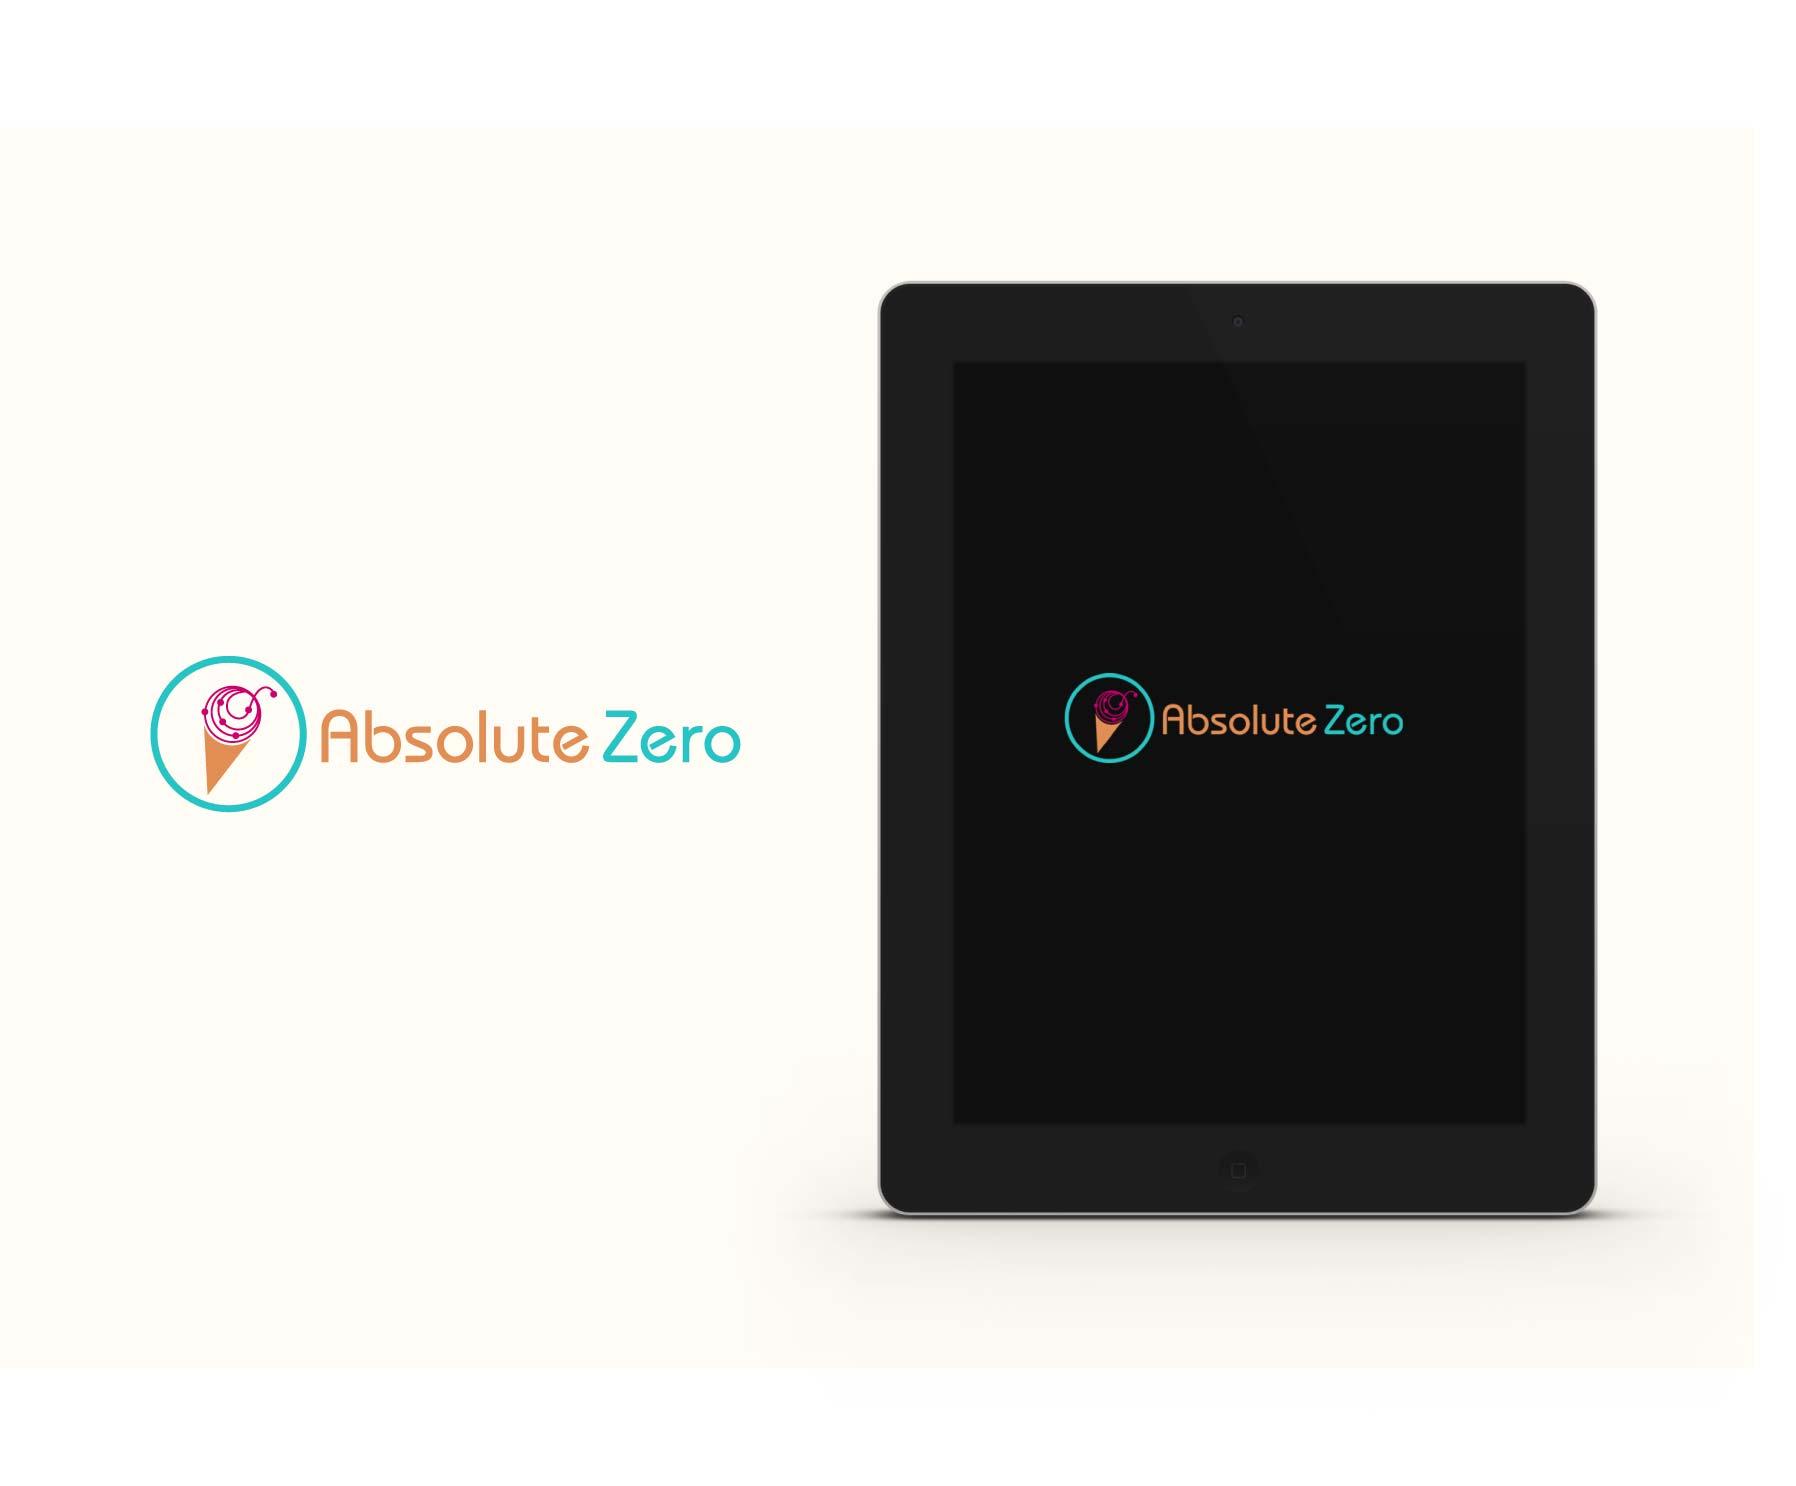 Logo Design by Osi Indra - Entry No. 27 in the Logo Design Contest Imaginative Logo Design for Absolute Zero.